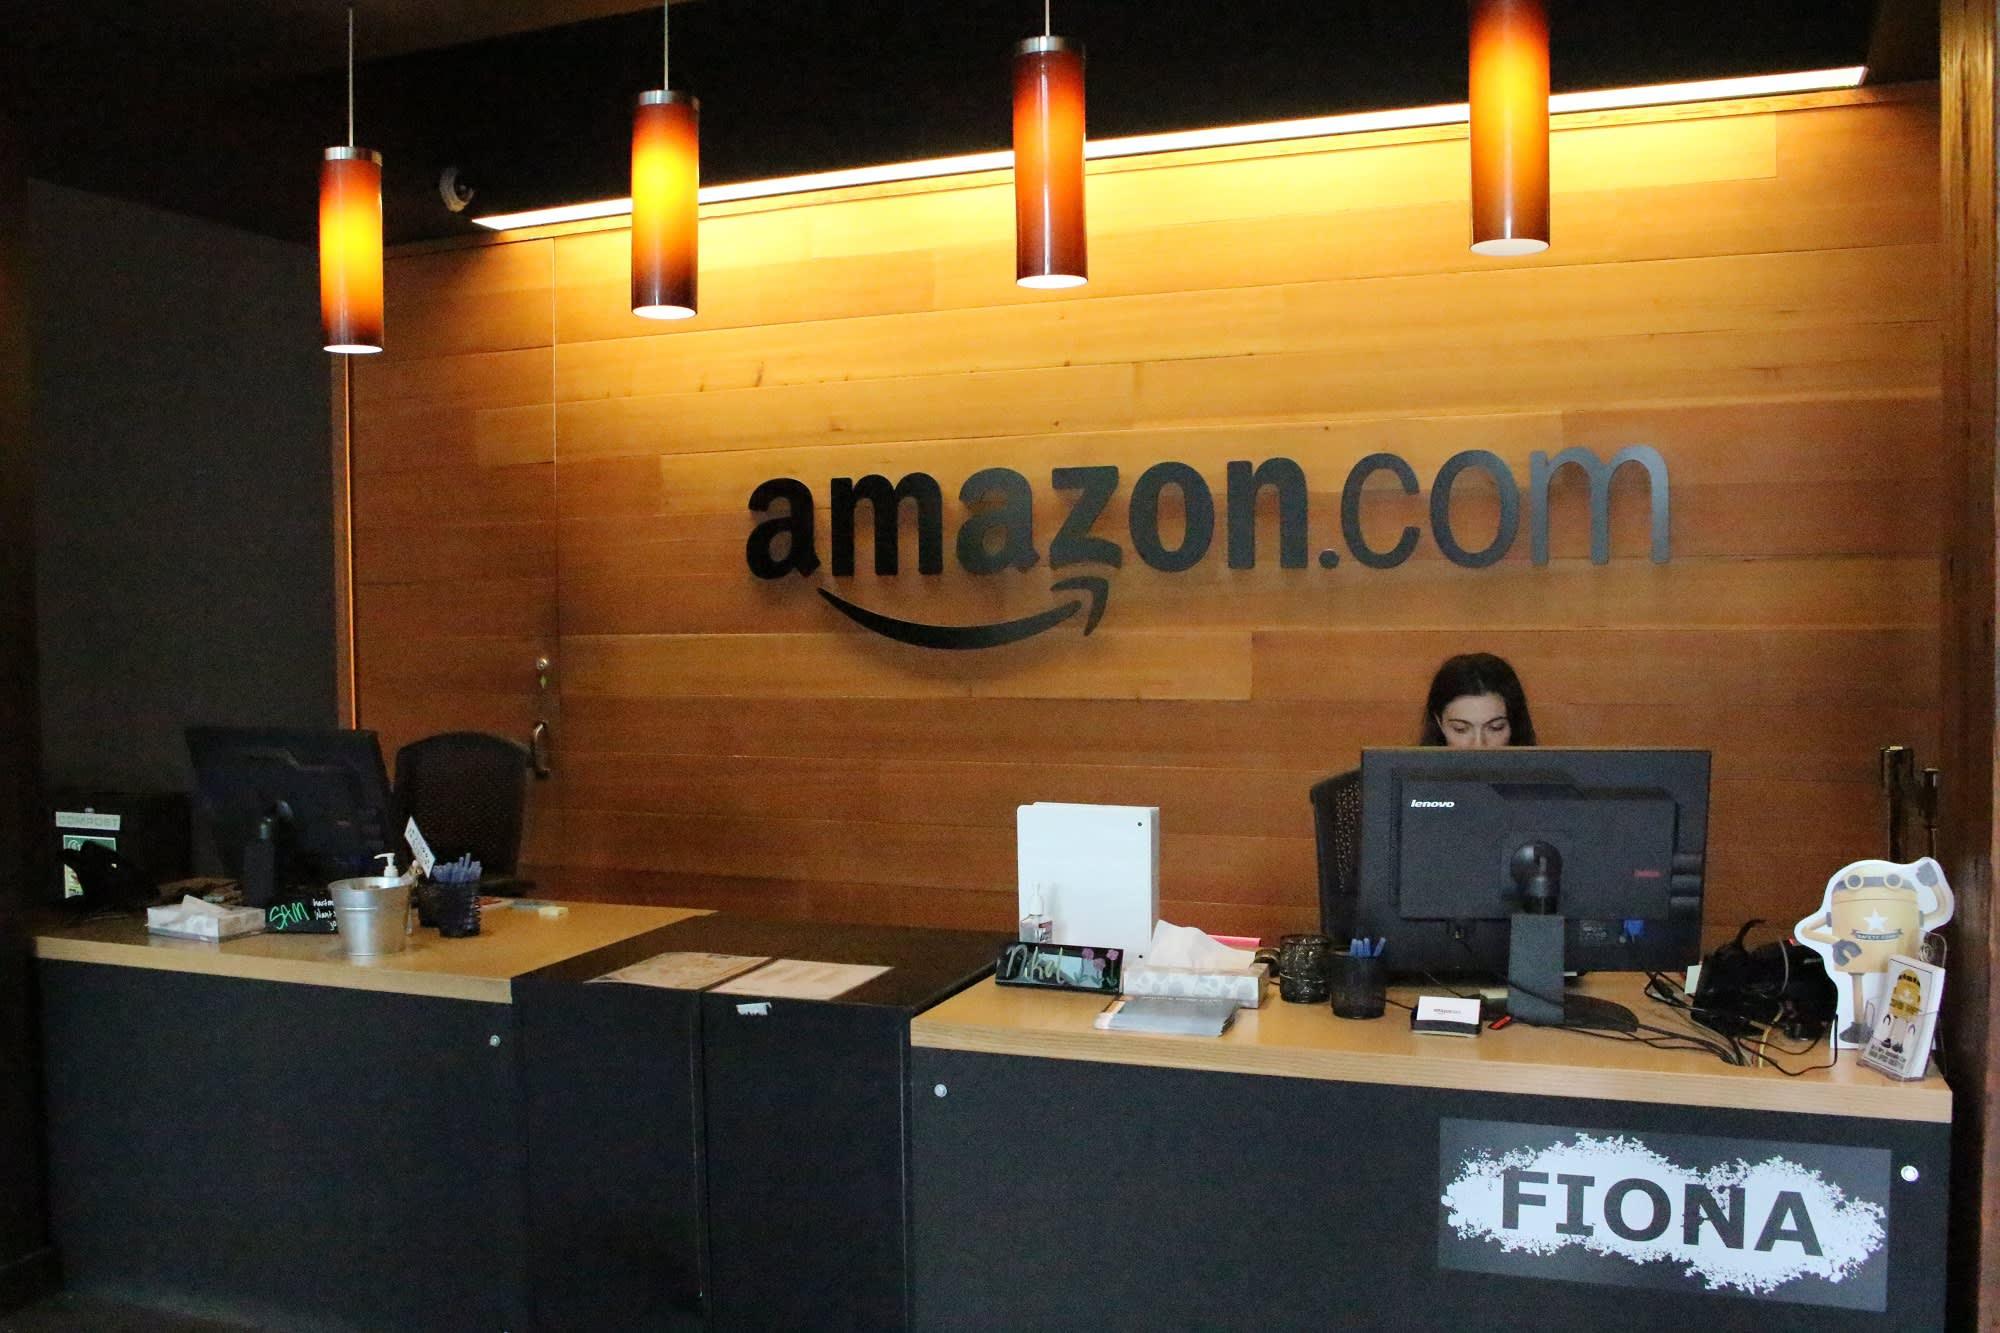 Amazon says it saved $1 billion in employee...